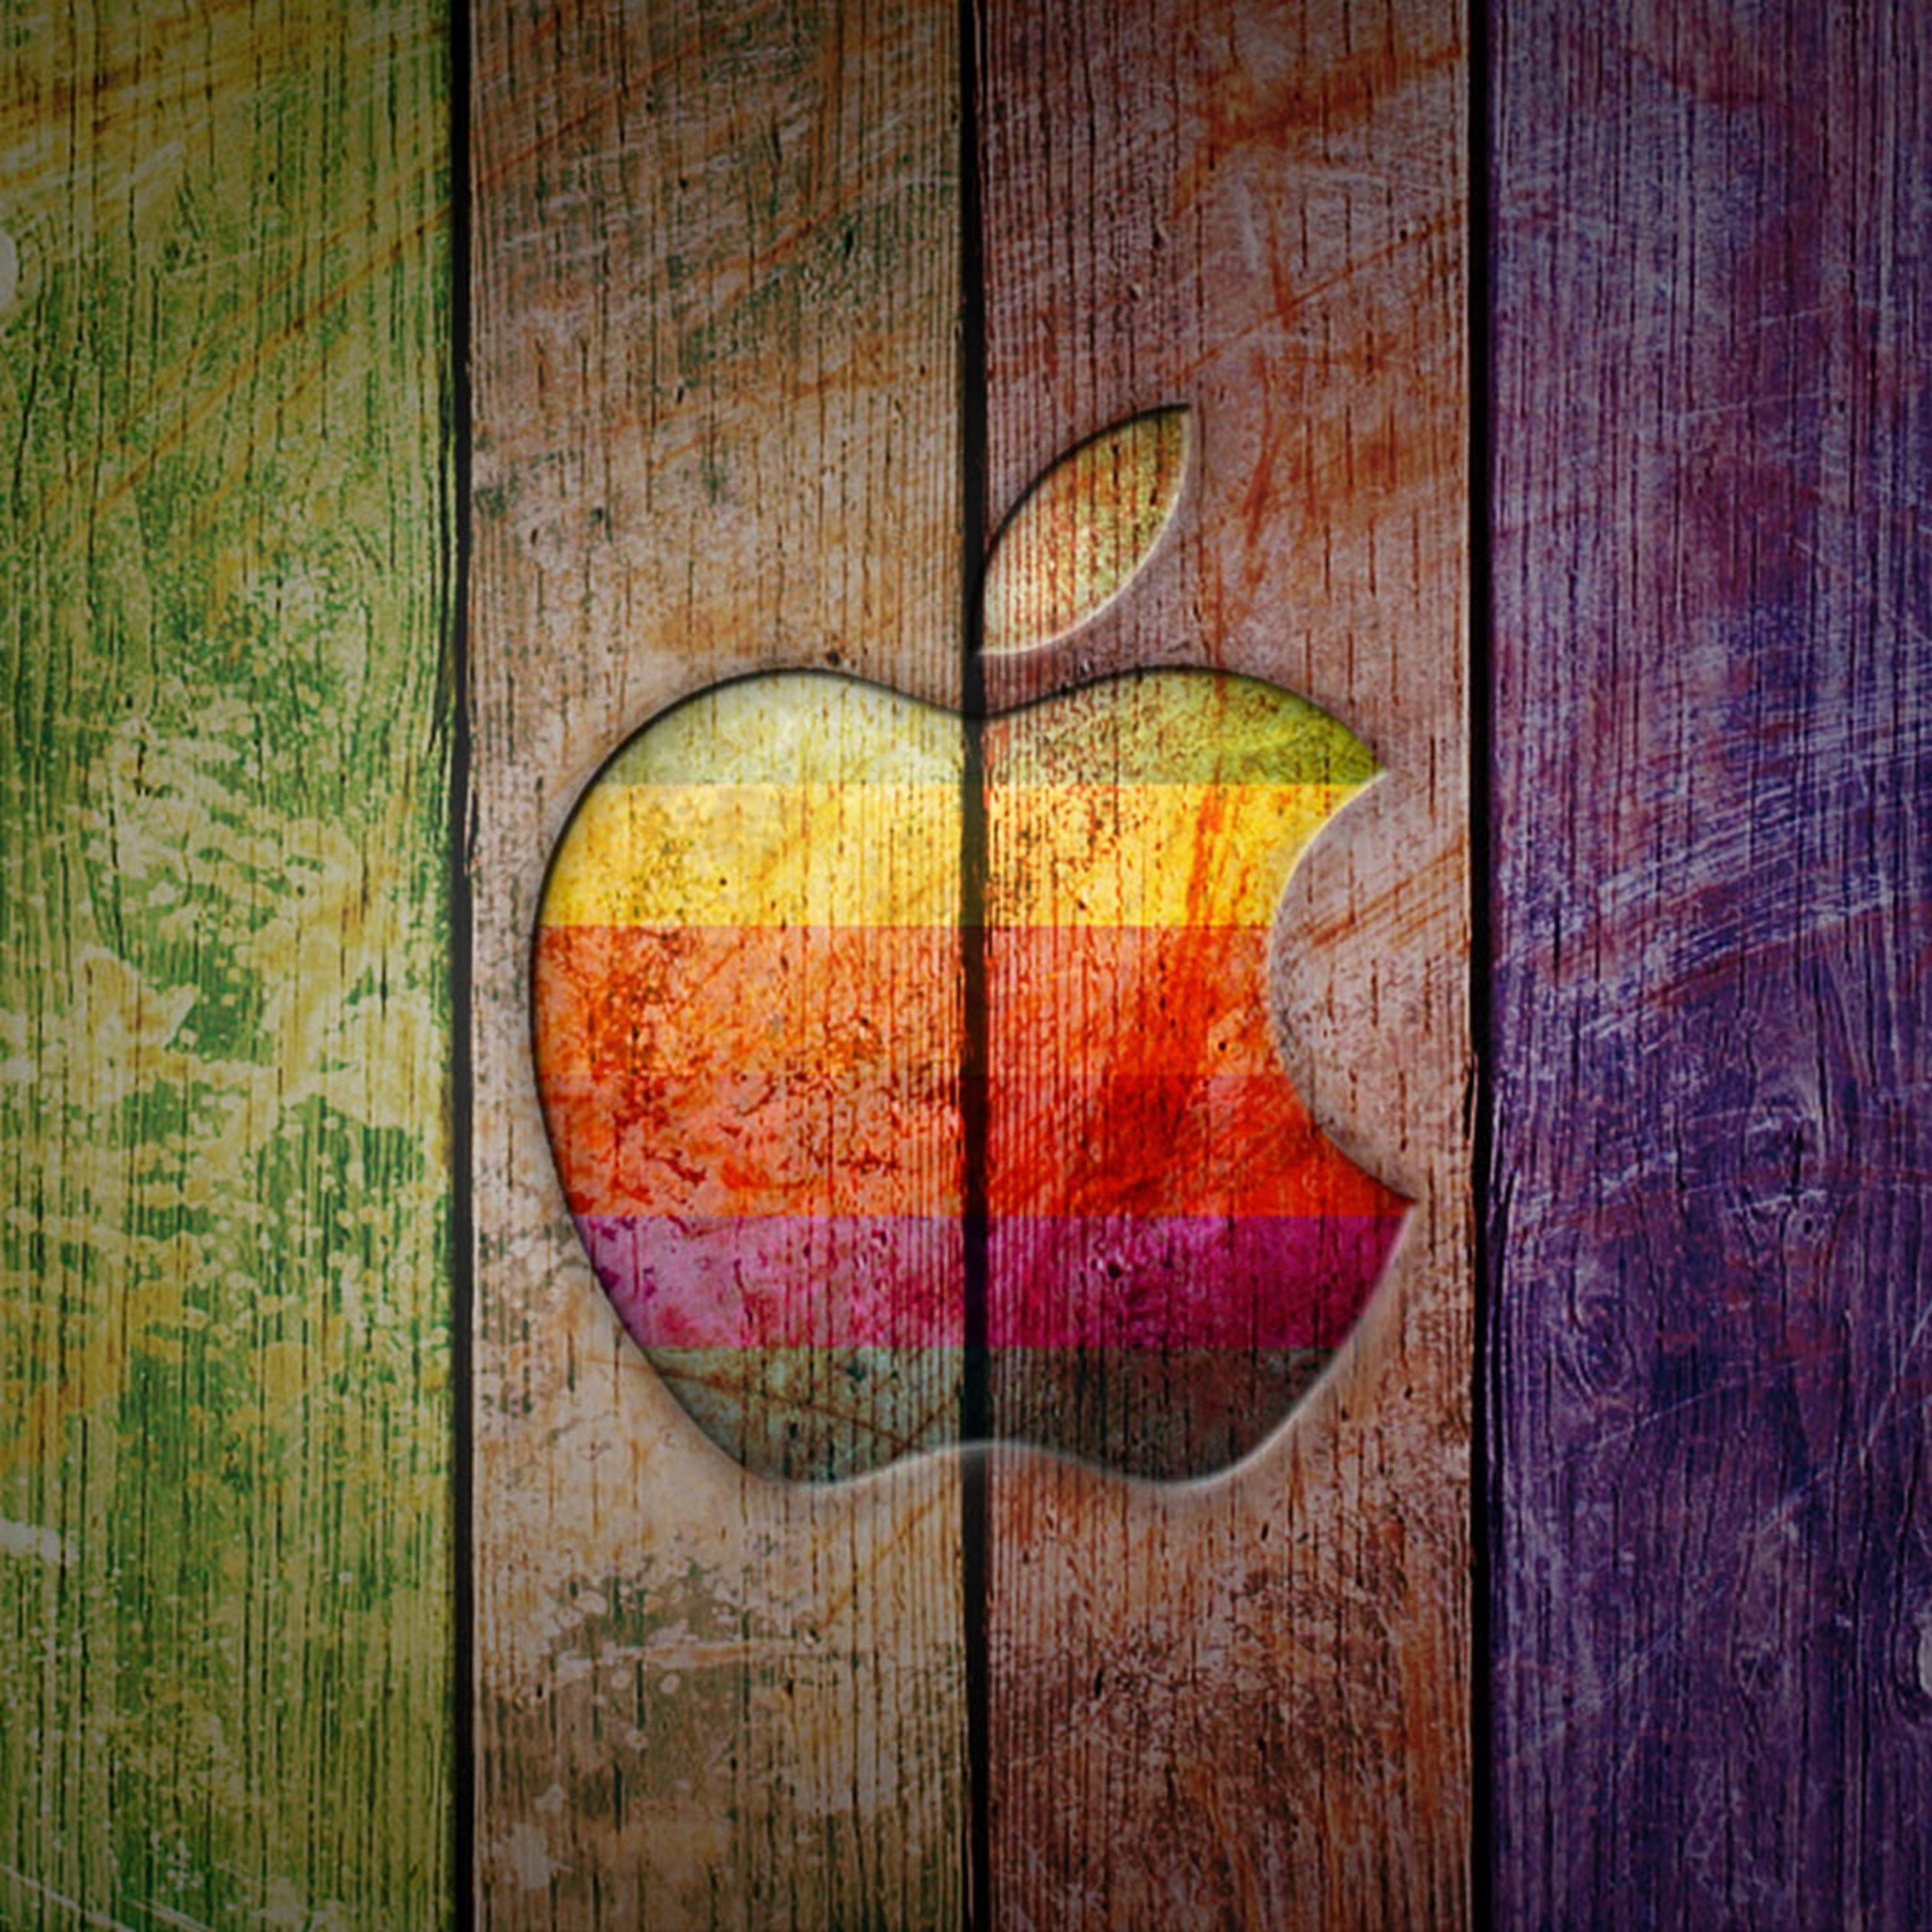 2524x2524 Parallax wallpaper 4k Apple Logo on Colorful Wood Ipad Wallpaper 2524x2524 pixels resolution